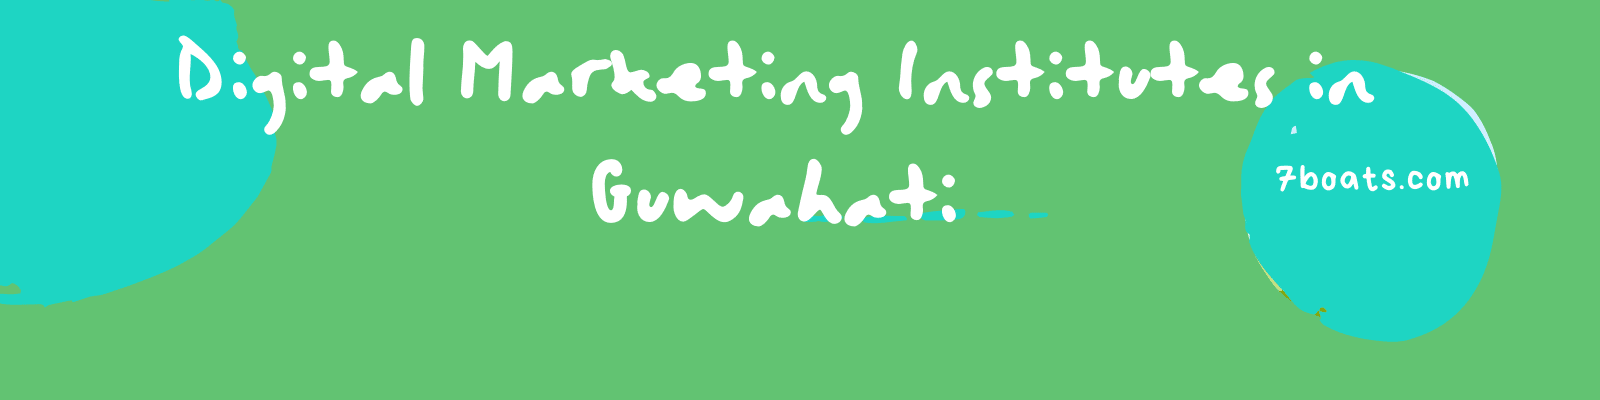 digital marketing institutes in Guwahati